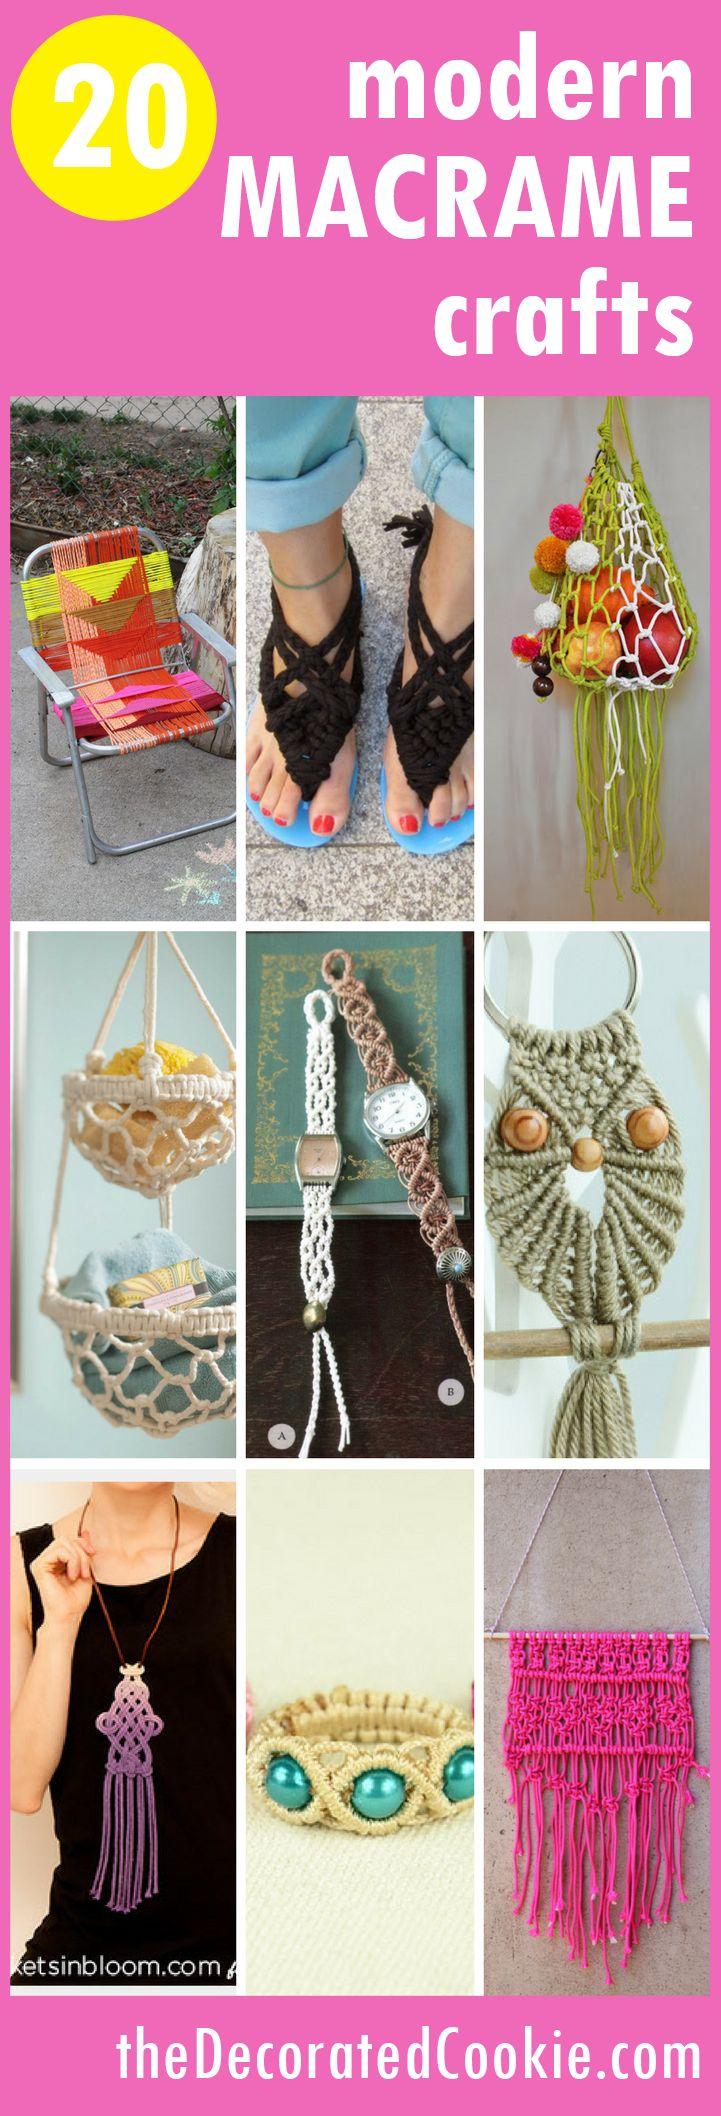 20 awesome modern macrame crafts